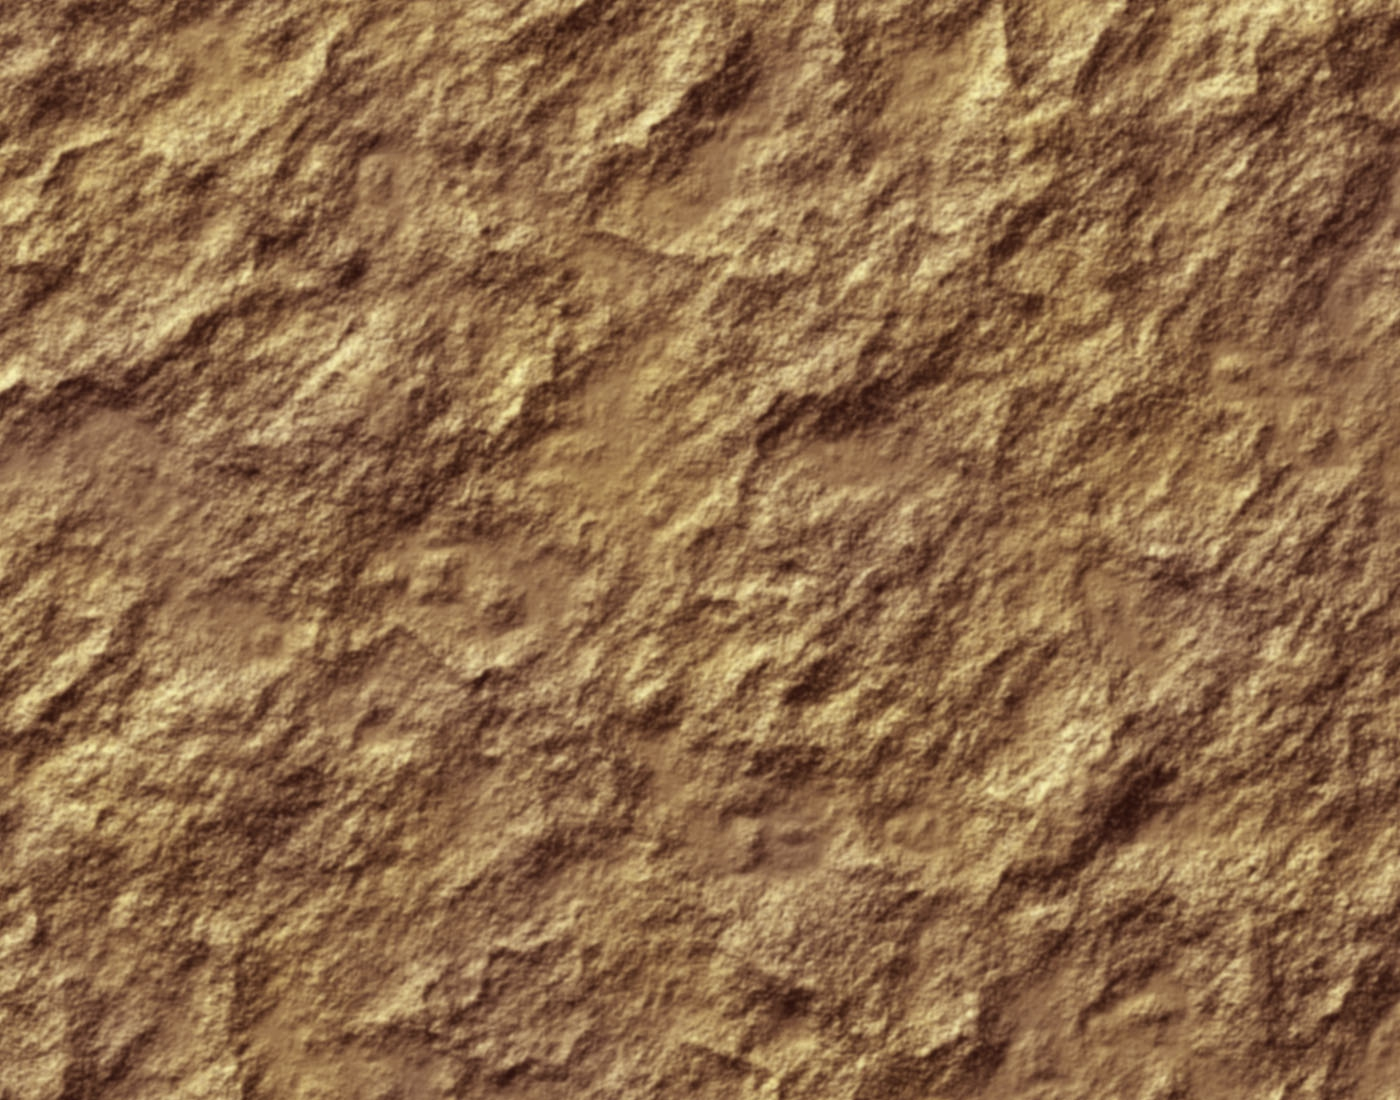 Graphismes Full Metal Planète - Page 2 Earthmap